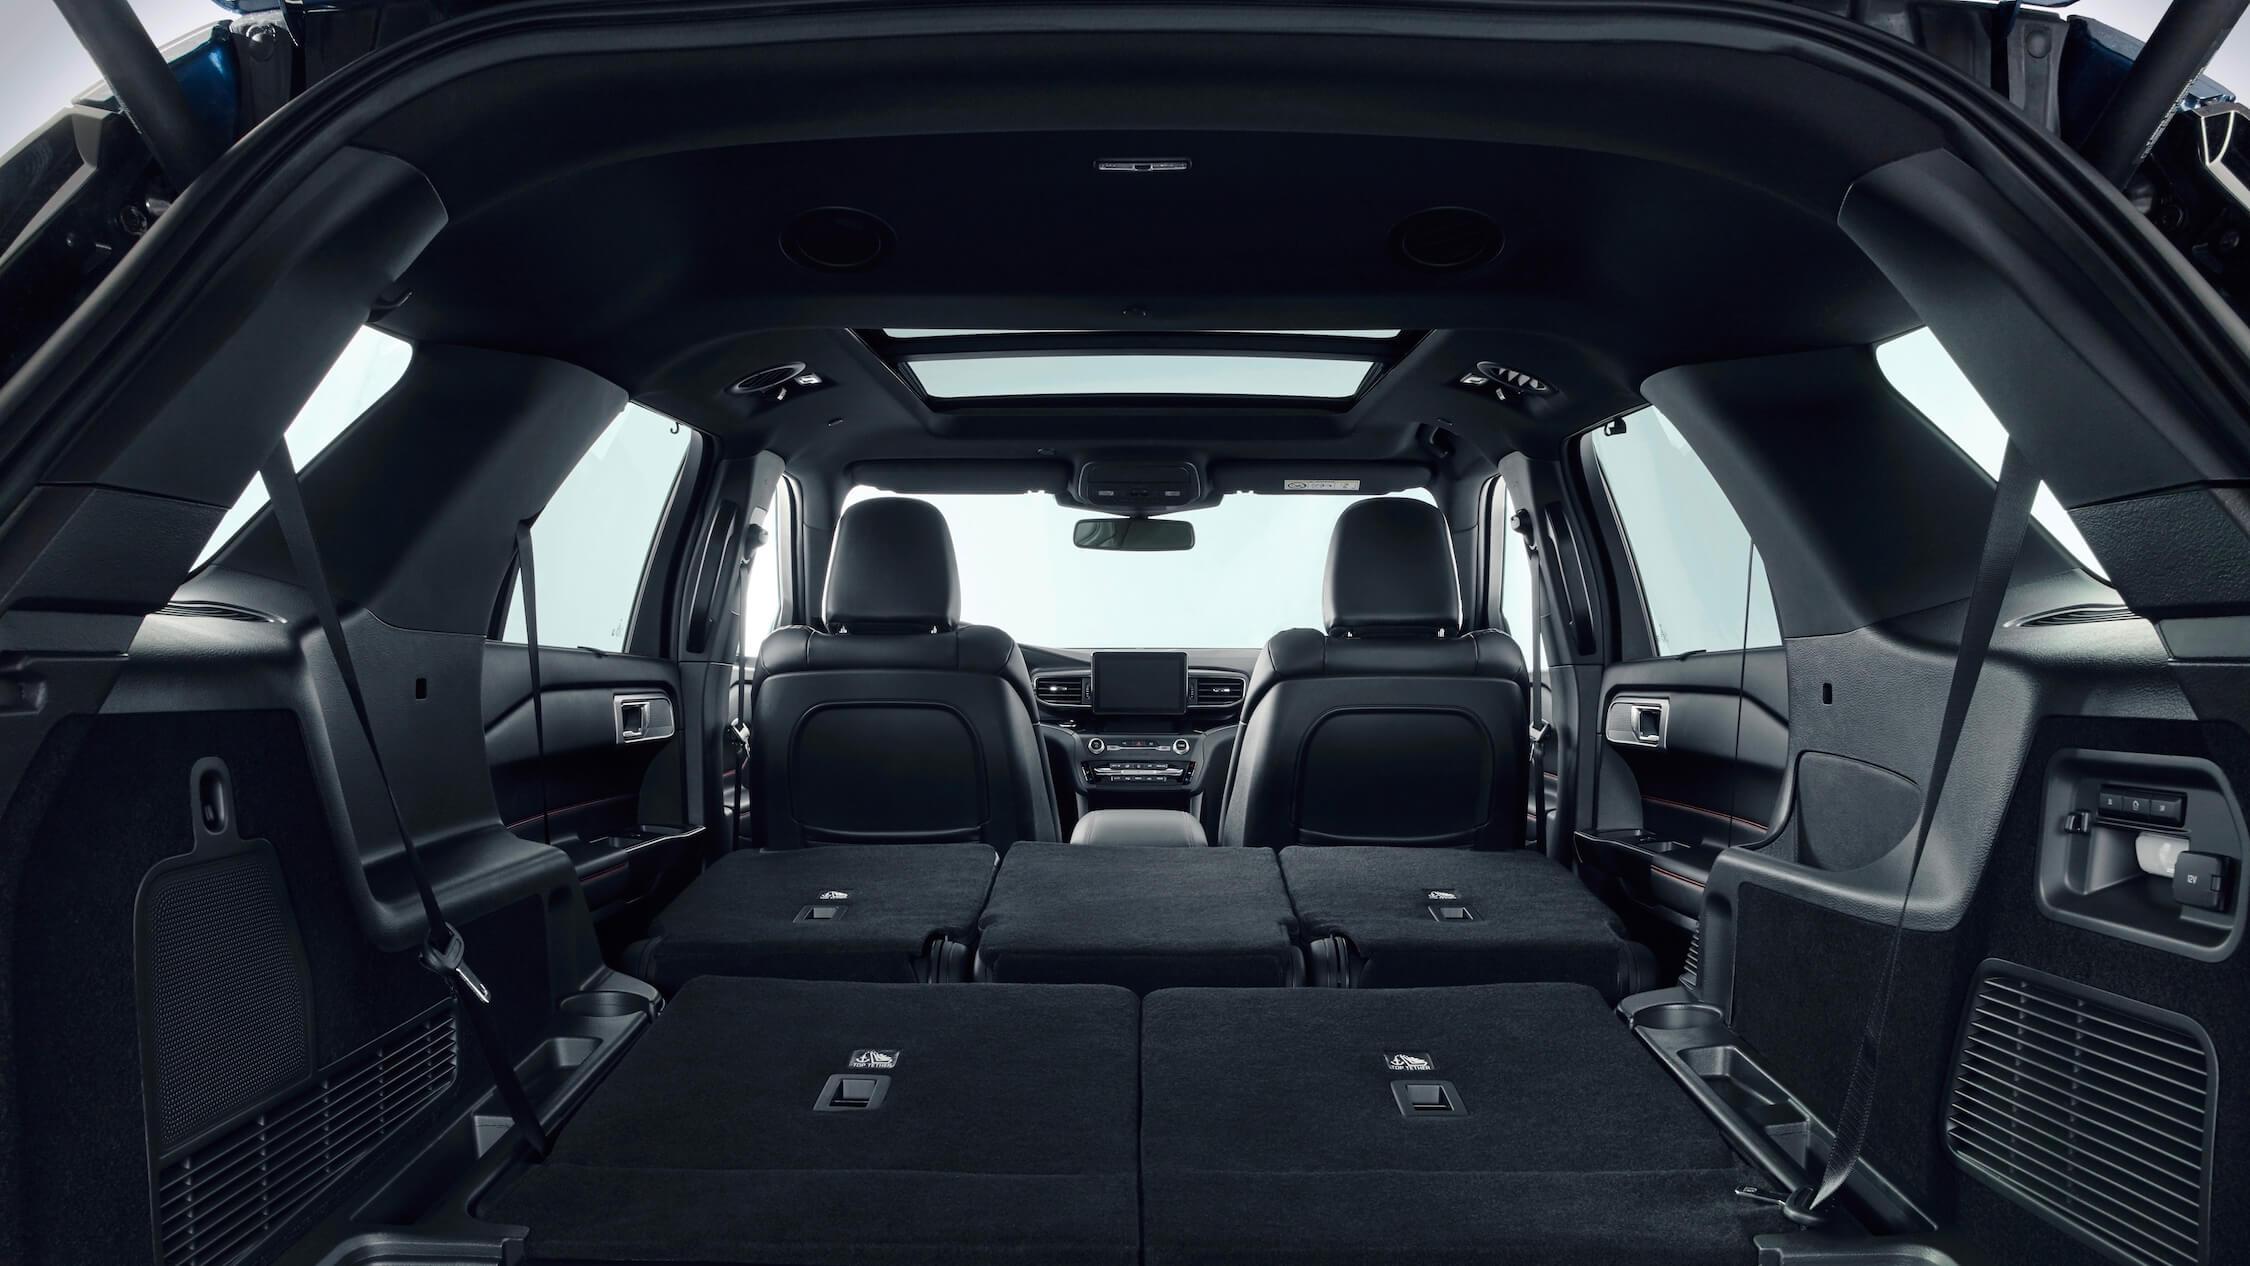 2020 Ford Explorer achterbank neergeklapt